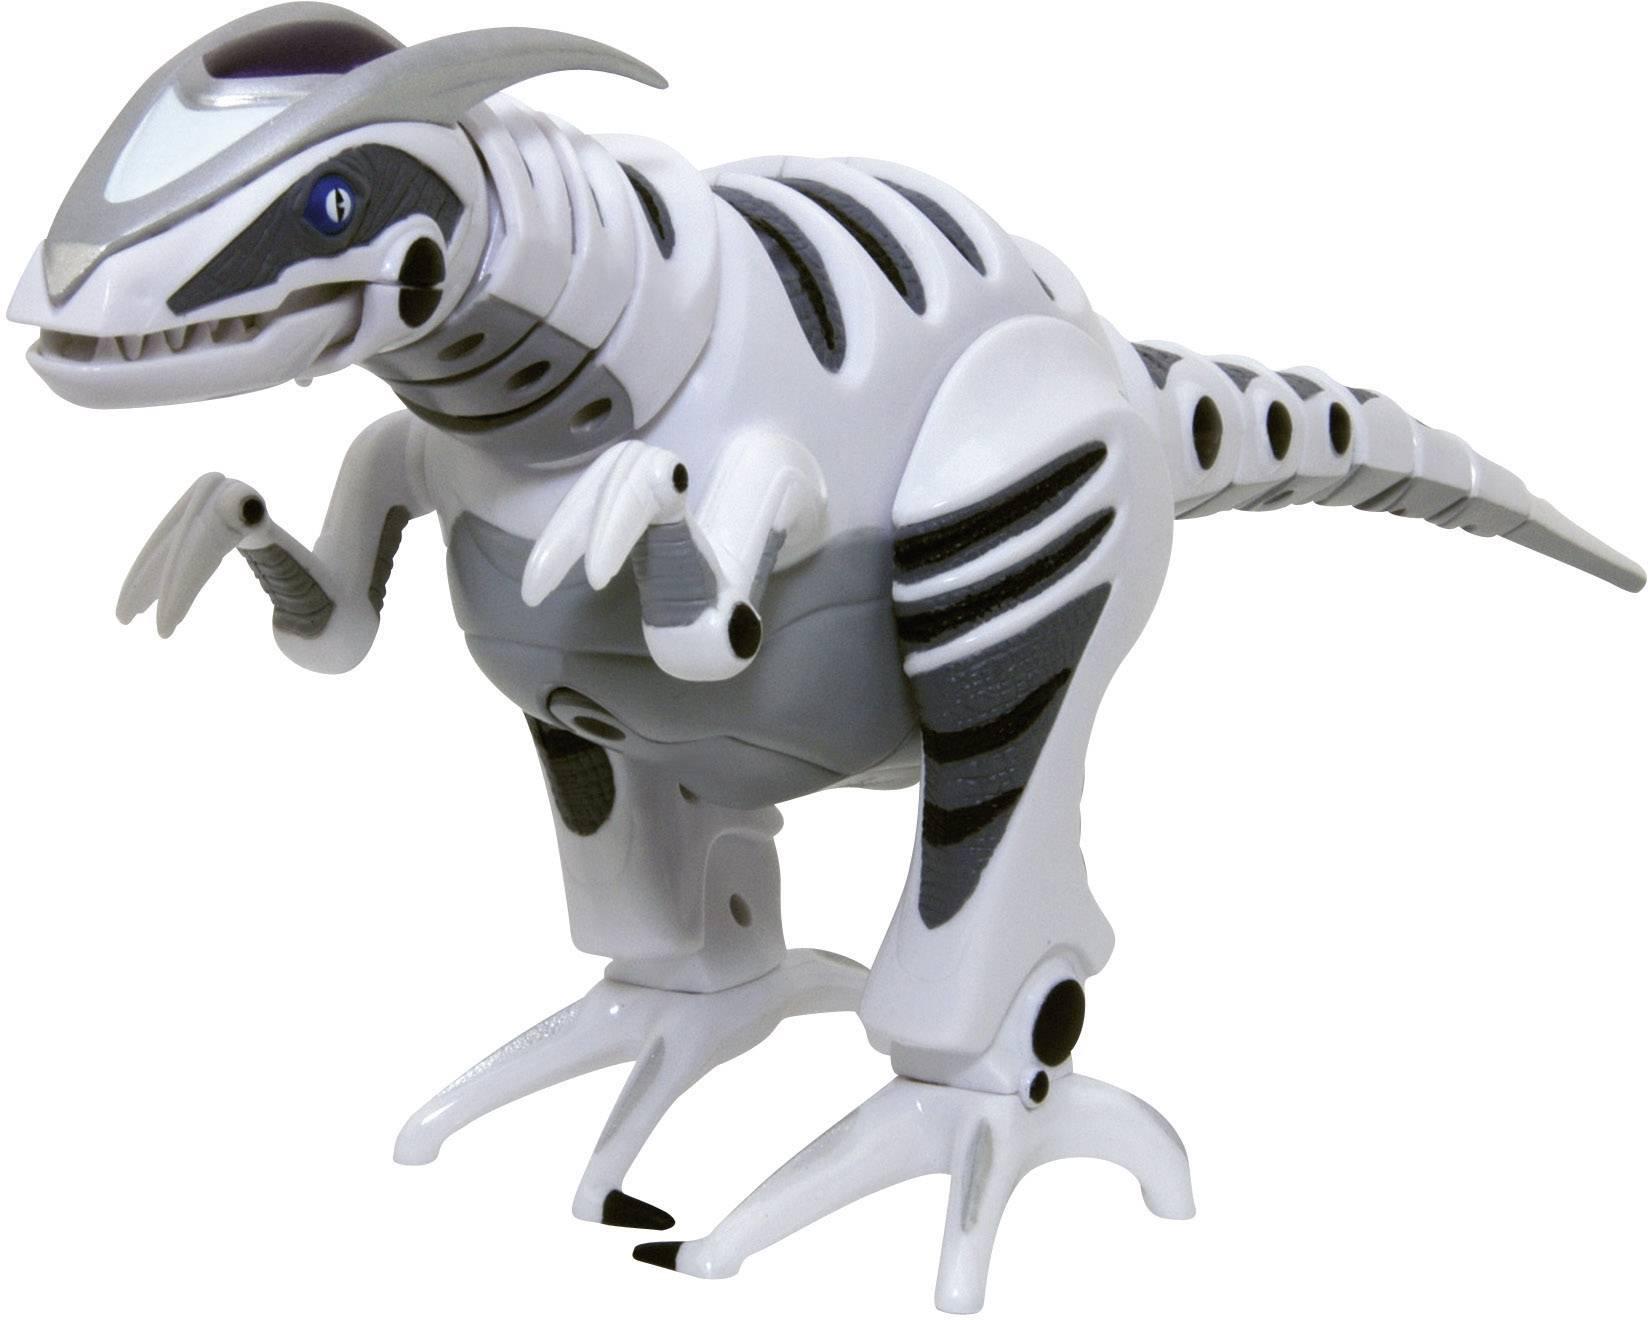 Hračka robota WowWee Robotics Mini Roboraptor 073-8195